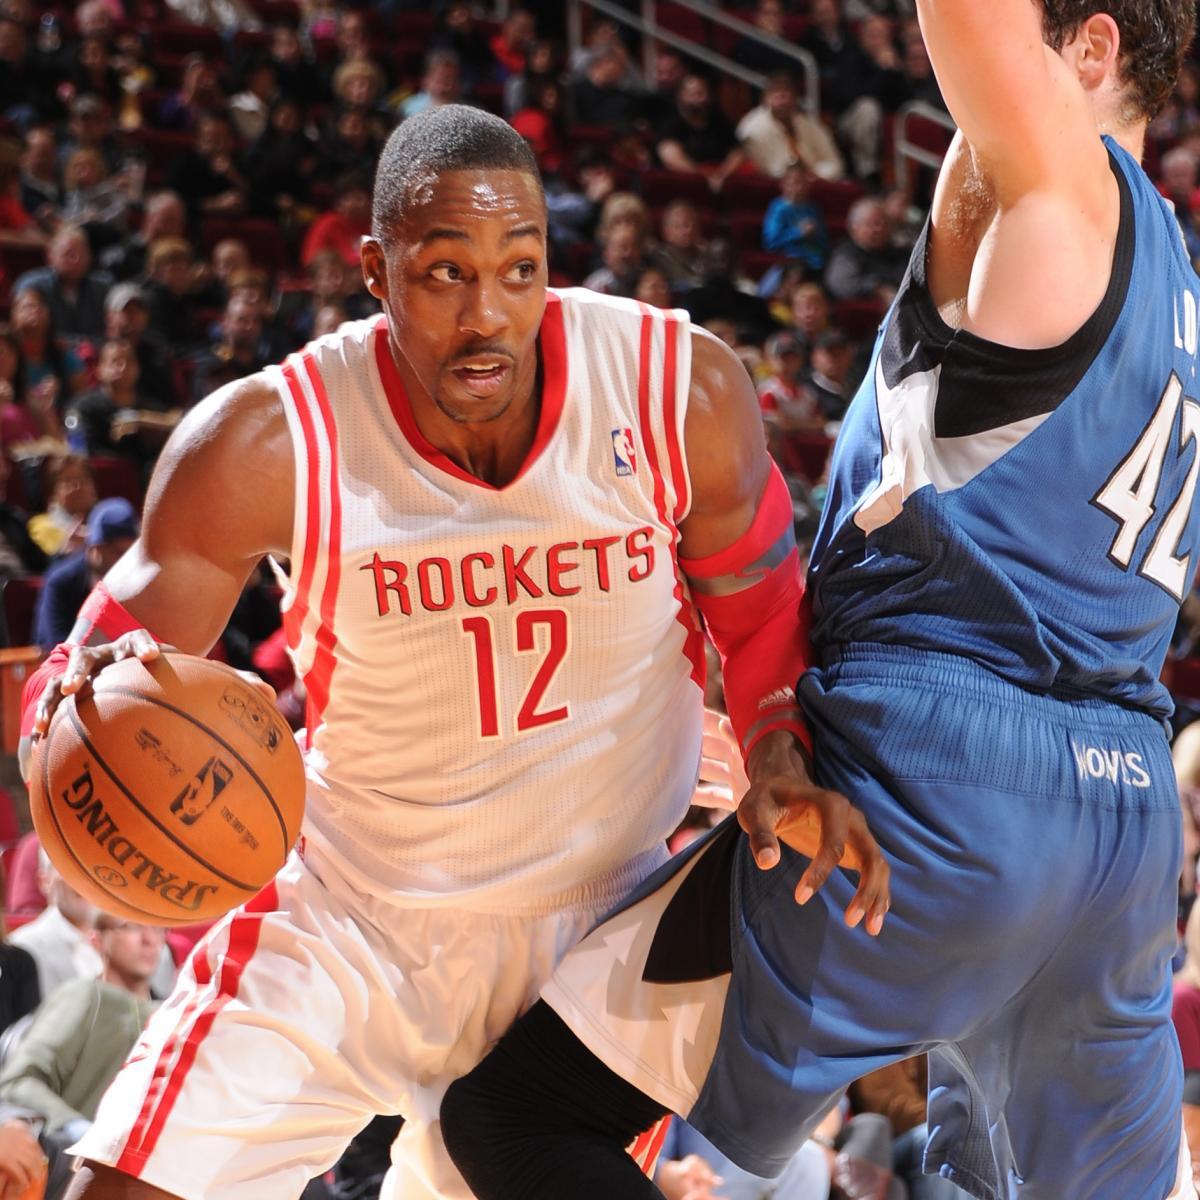 Houston Rockets Vs. Minnesota Timberwolves: Live Score And